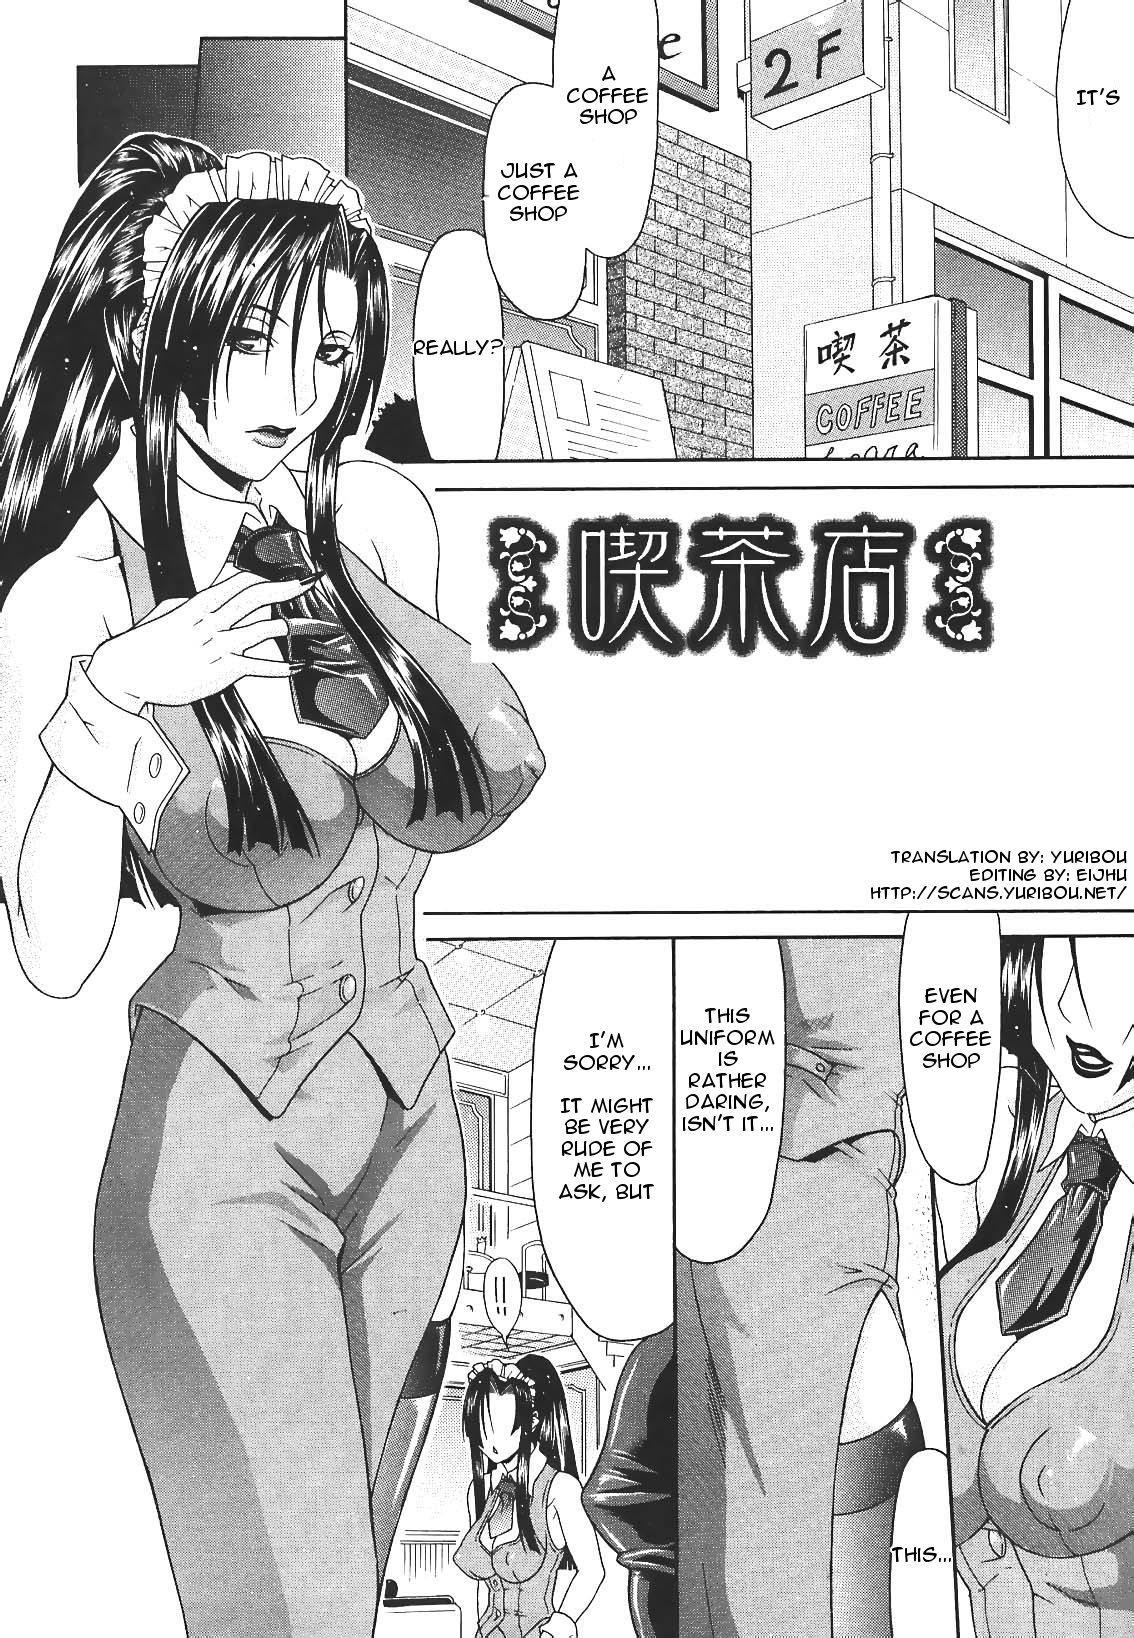 Gura Nyuutou - Escape chapter 7 5